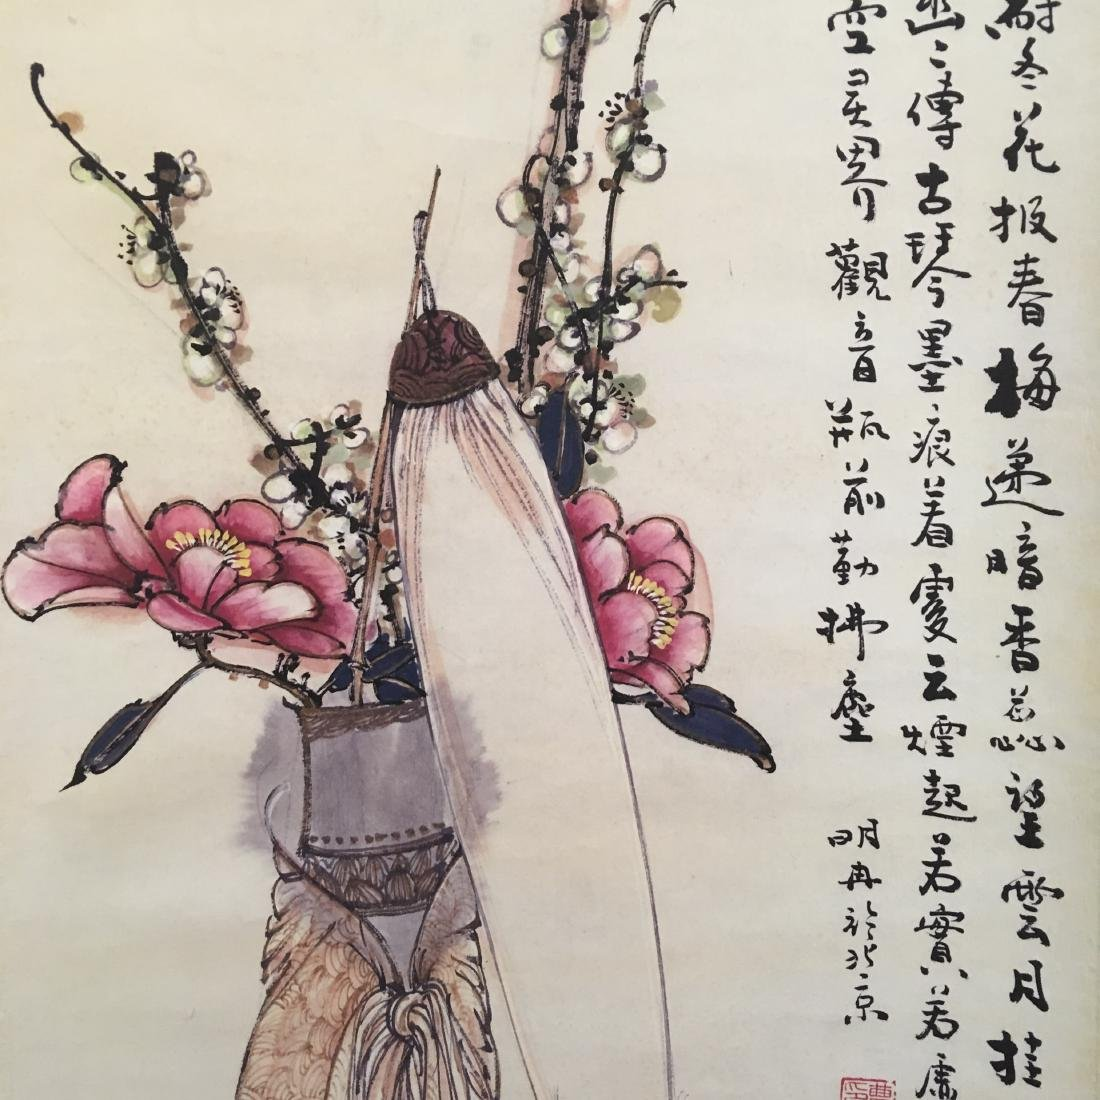 Chinese Hanging Scroll Painting, Ming Ran Signature - 5